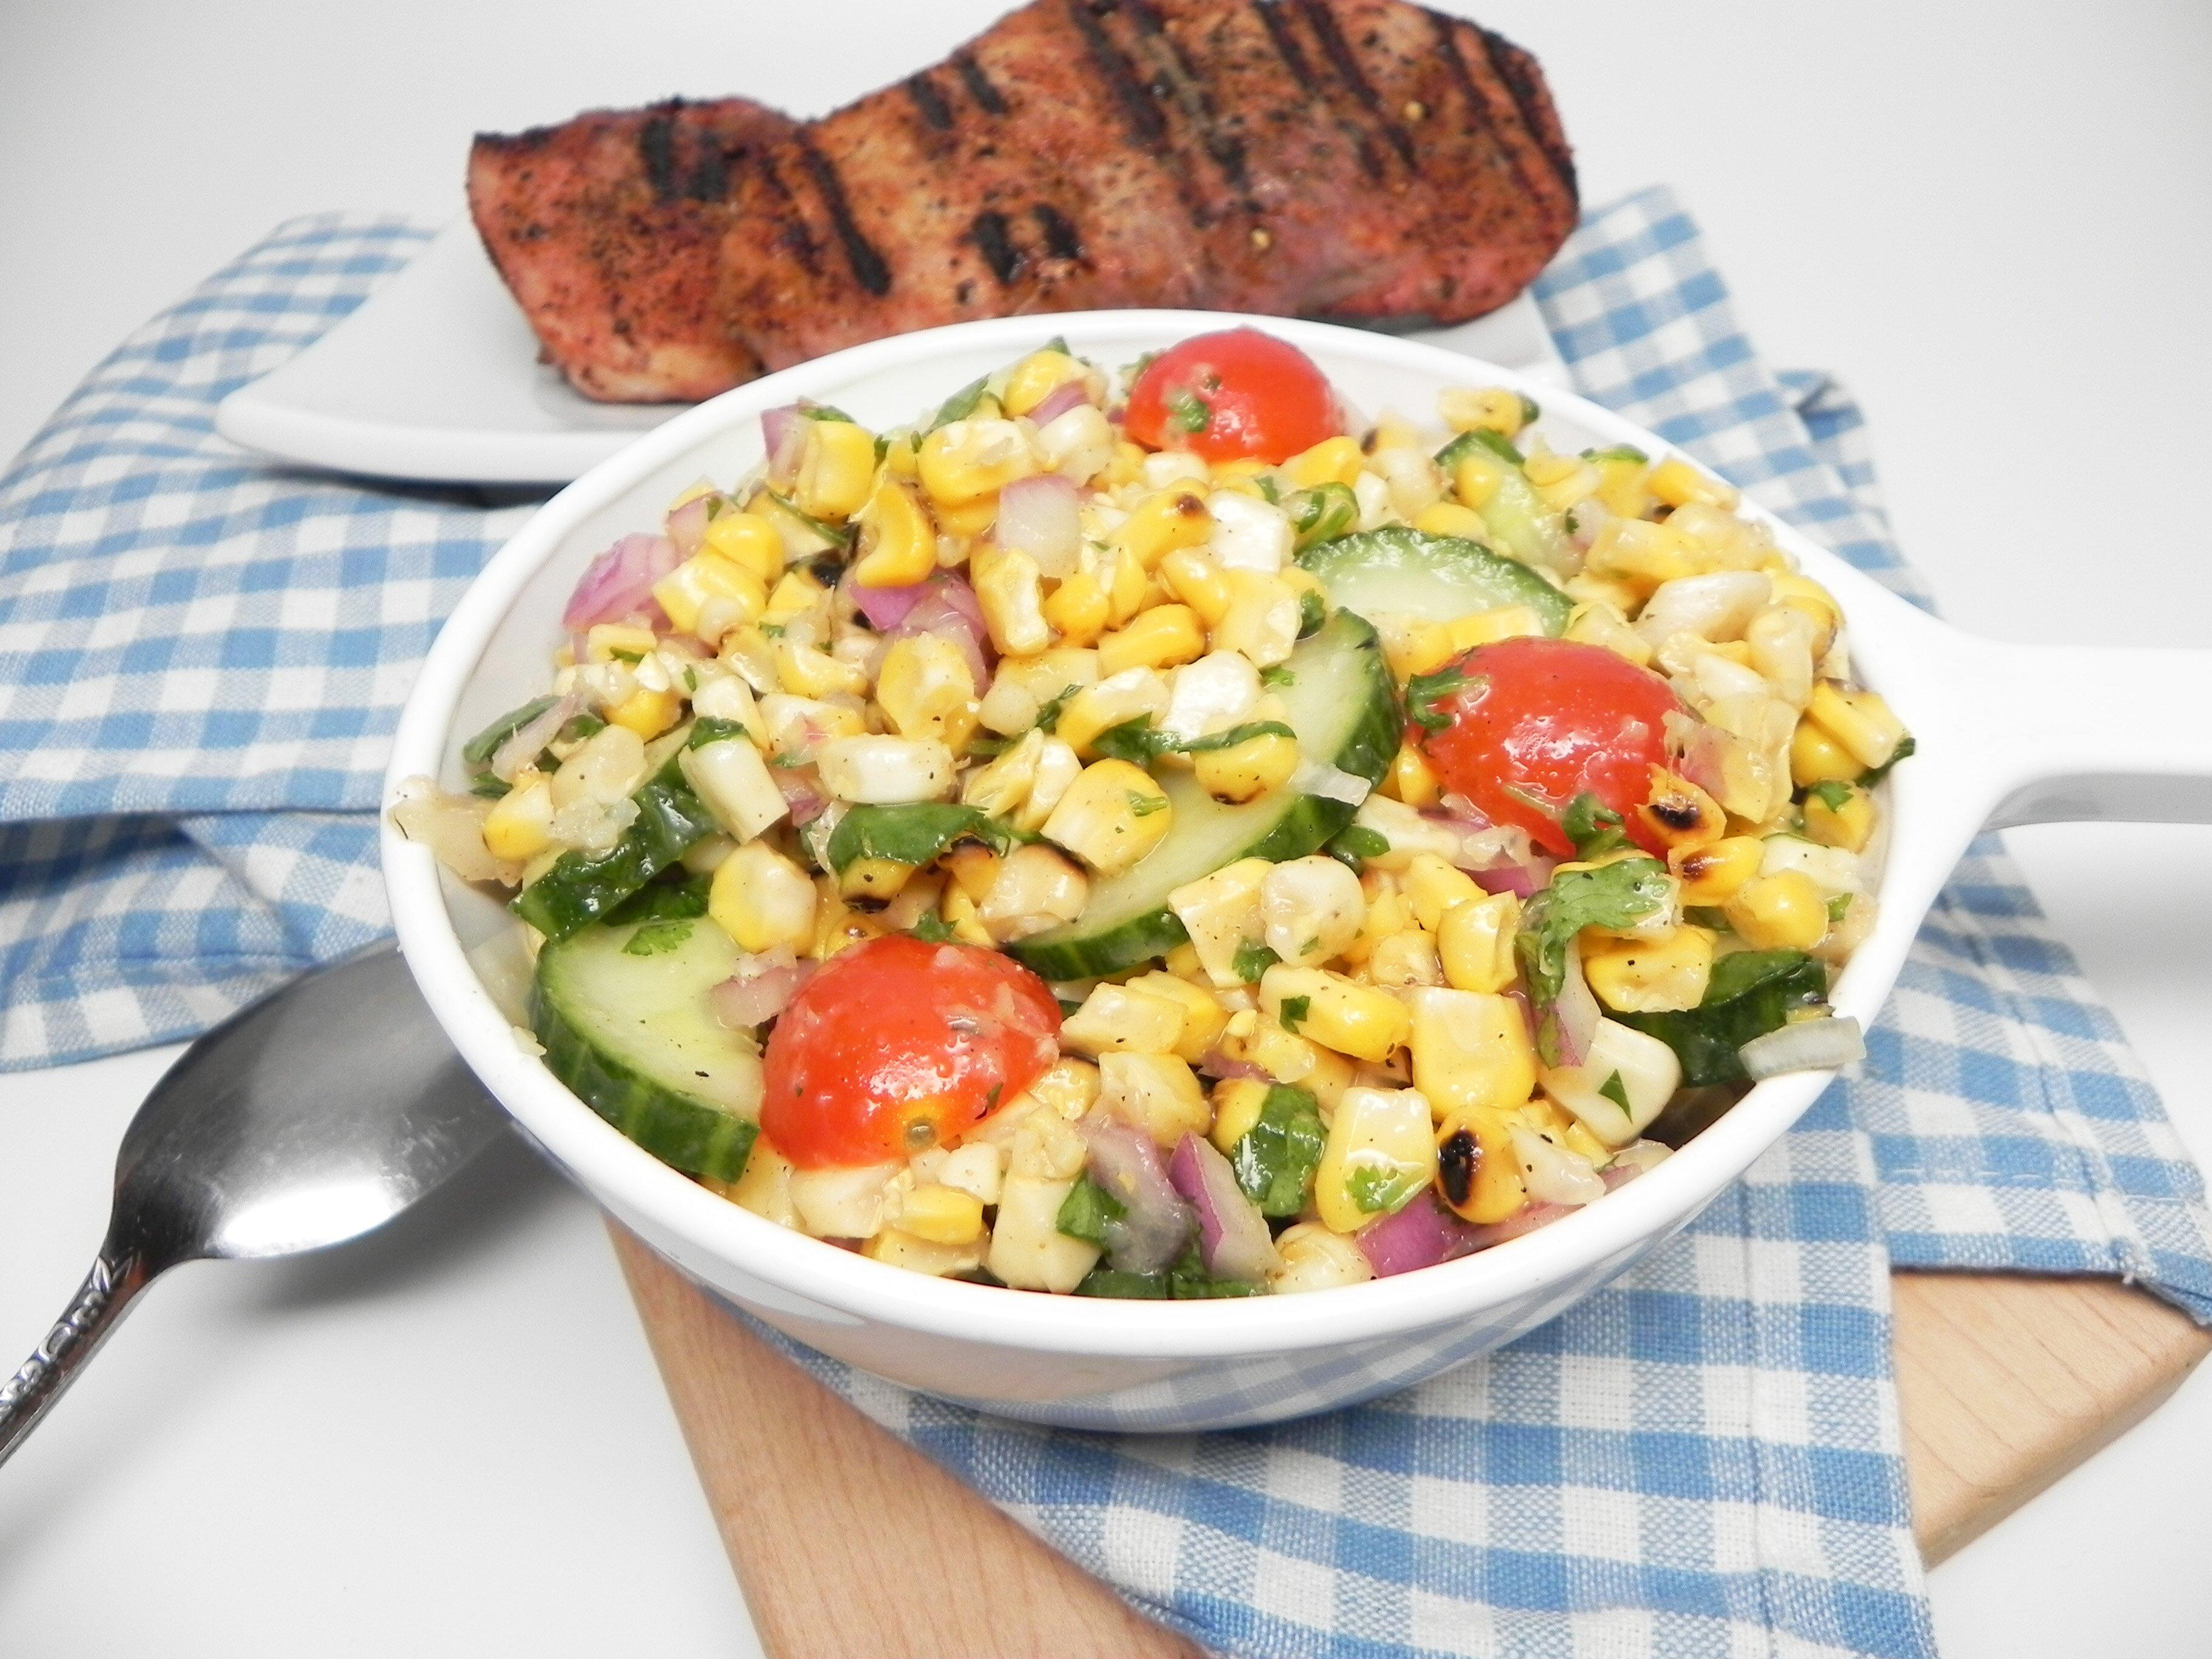 nicoles grilled corn salad